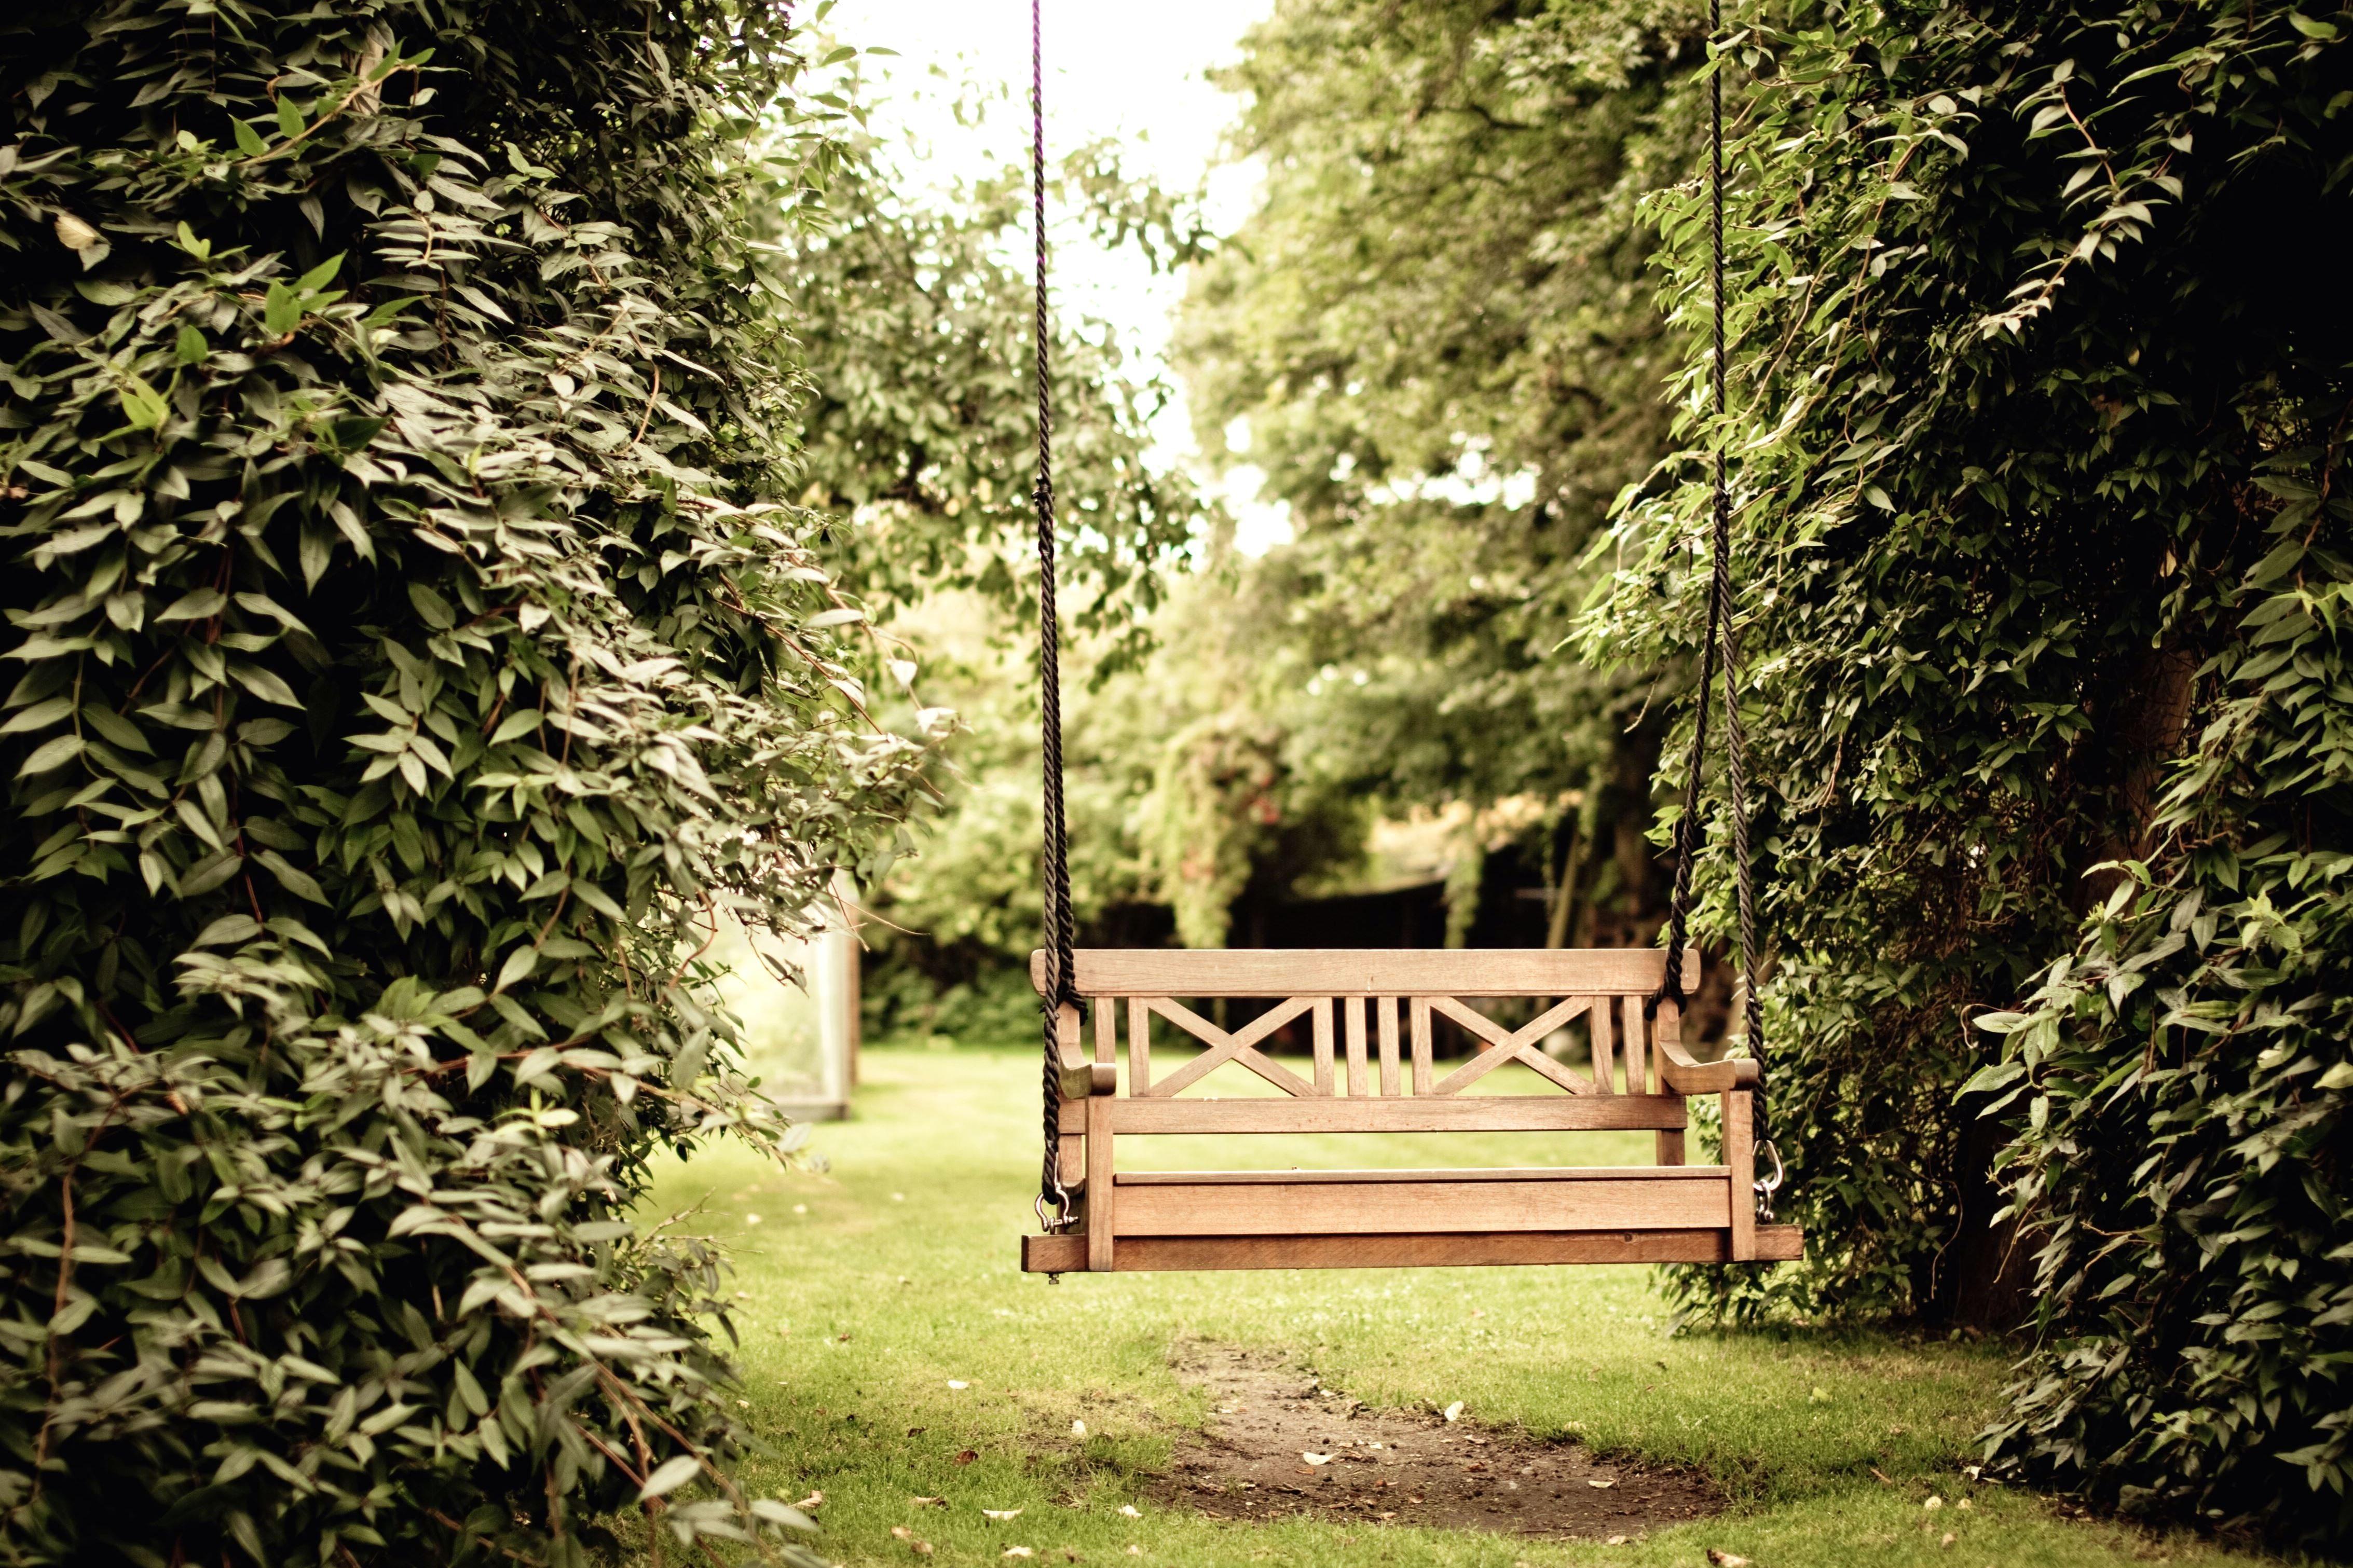 Image Libre Jardin Herbe Arbre Bois Arbres Balan 231 Oire